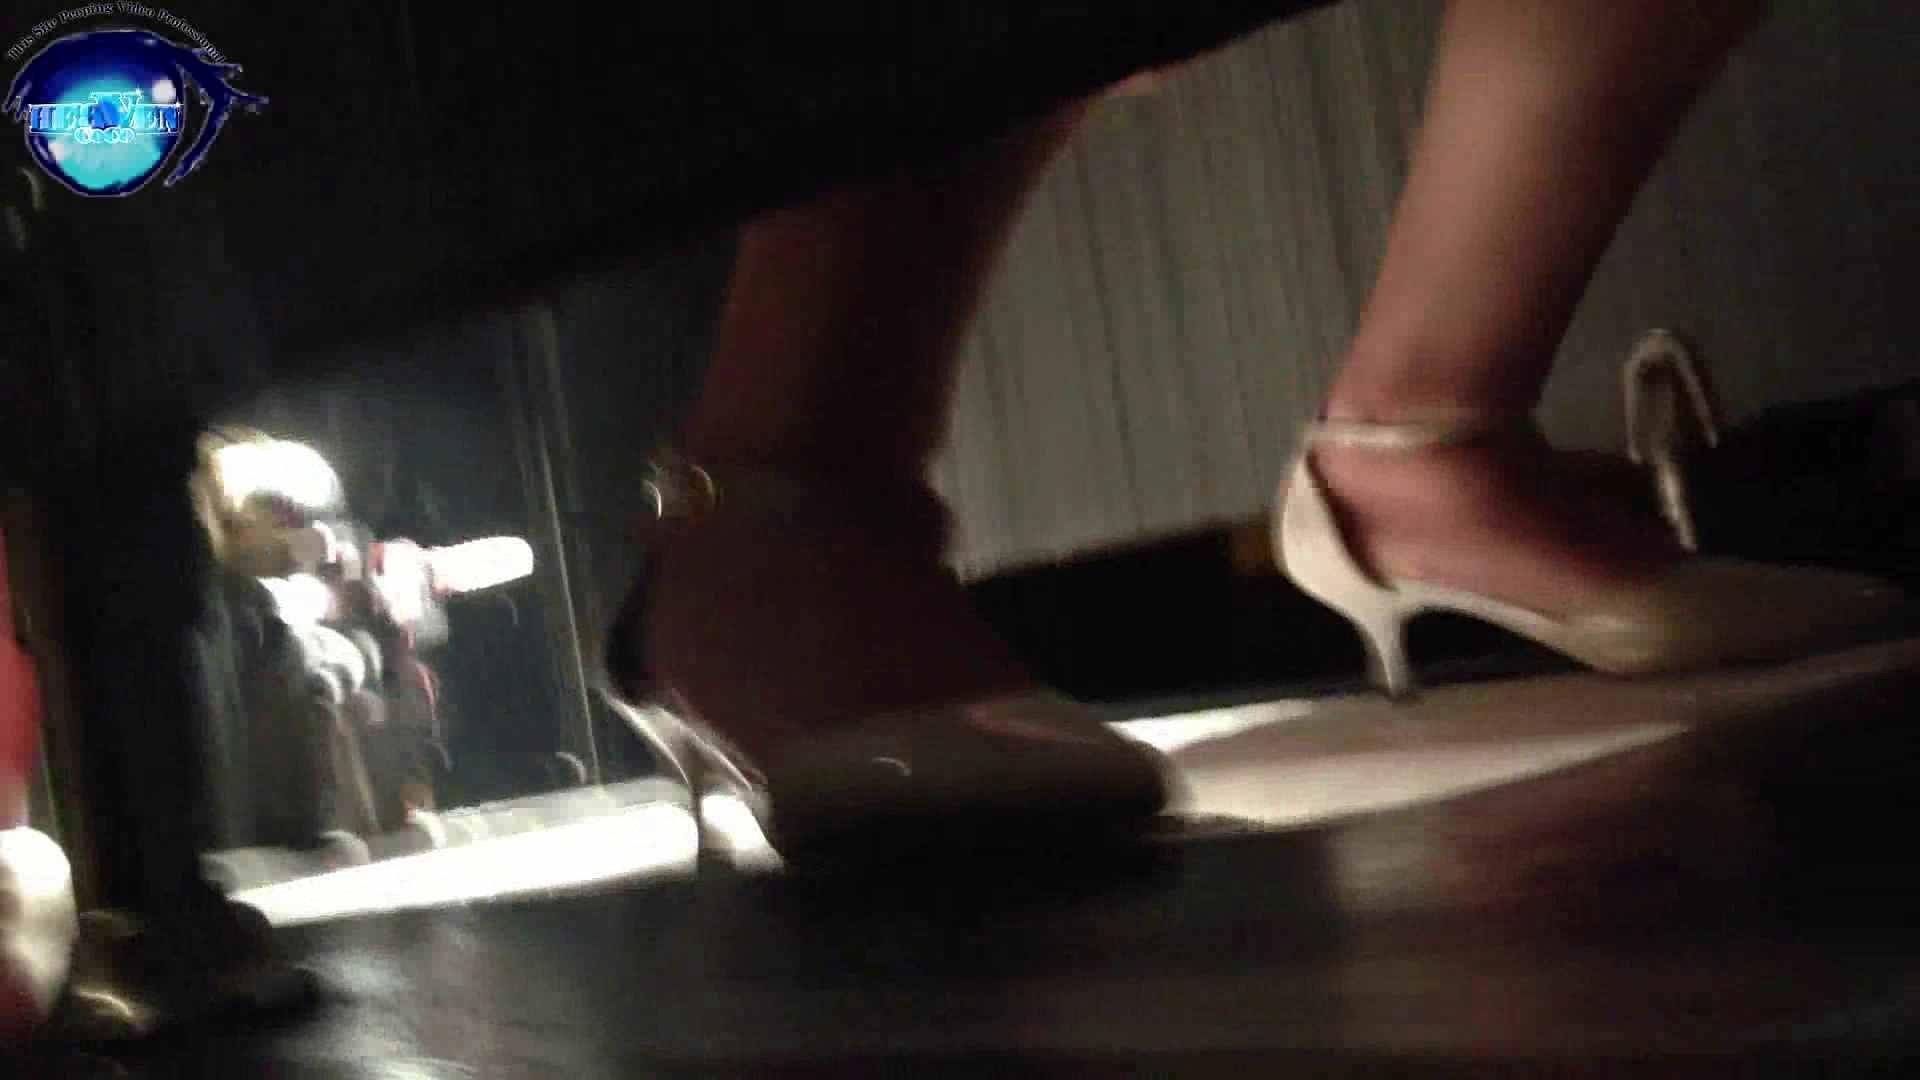 GOD HAND ファッションショッピングセンター盗撮vol.03後編 高画質 おまんこ無修正動画無料 96pic 68